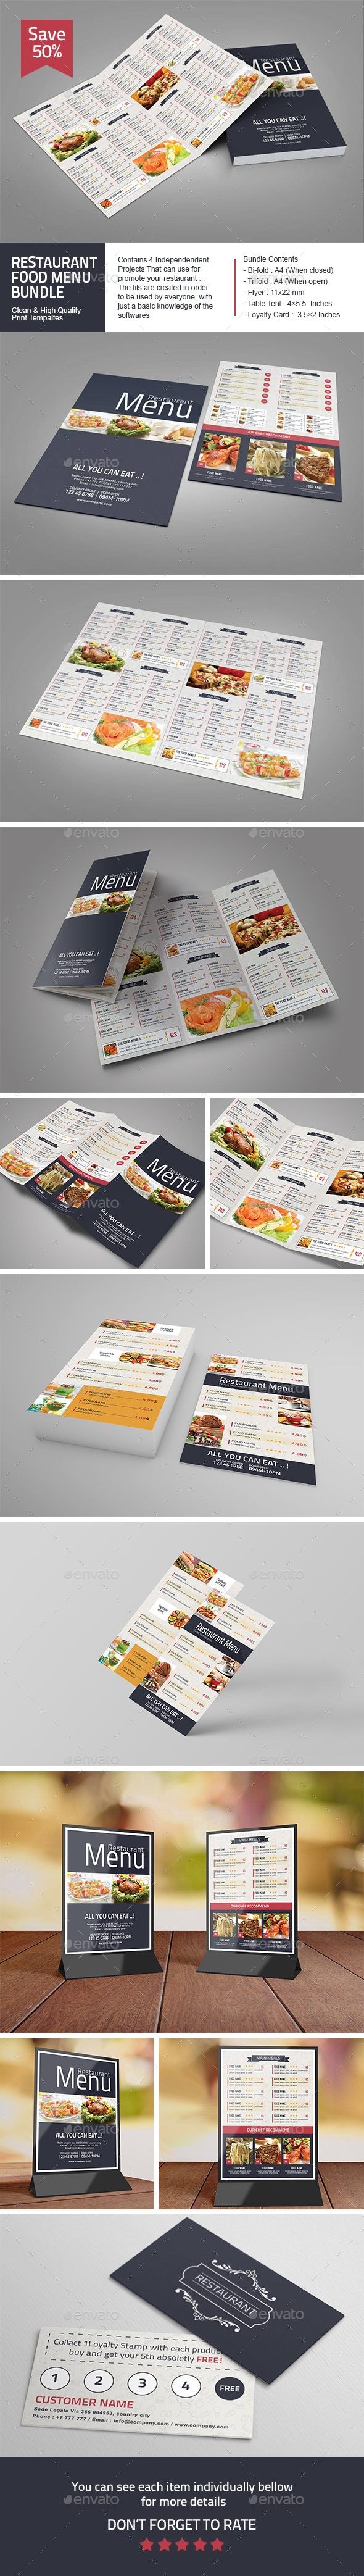 Restaurant Food Menu Bundle